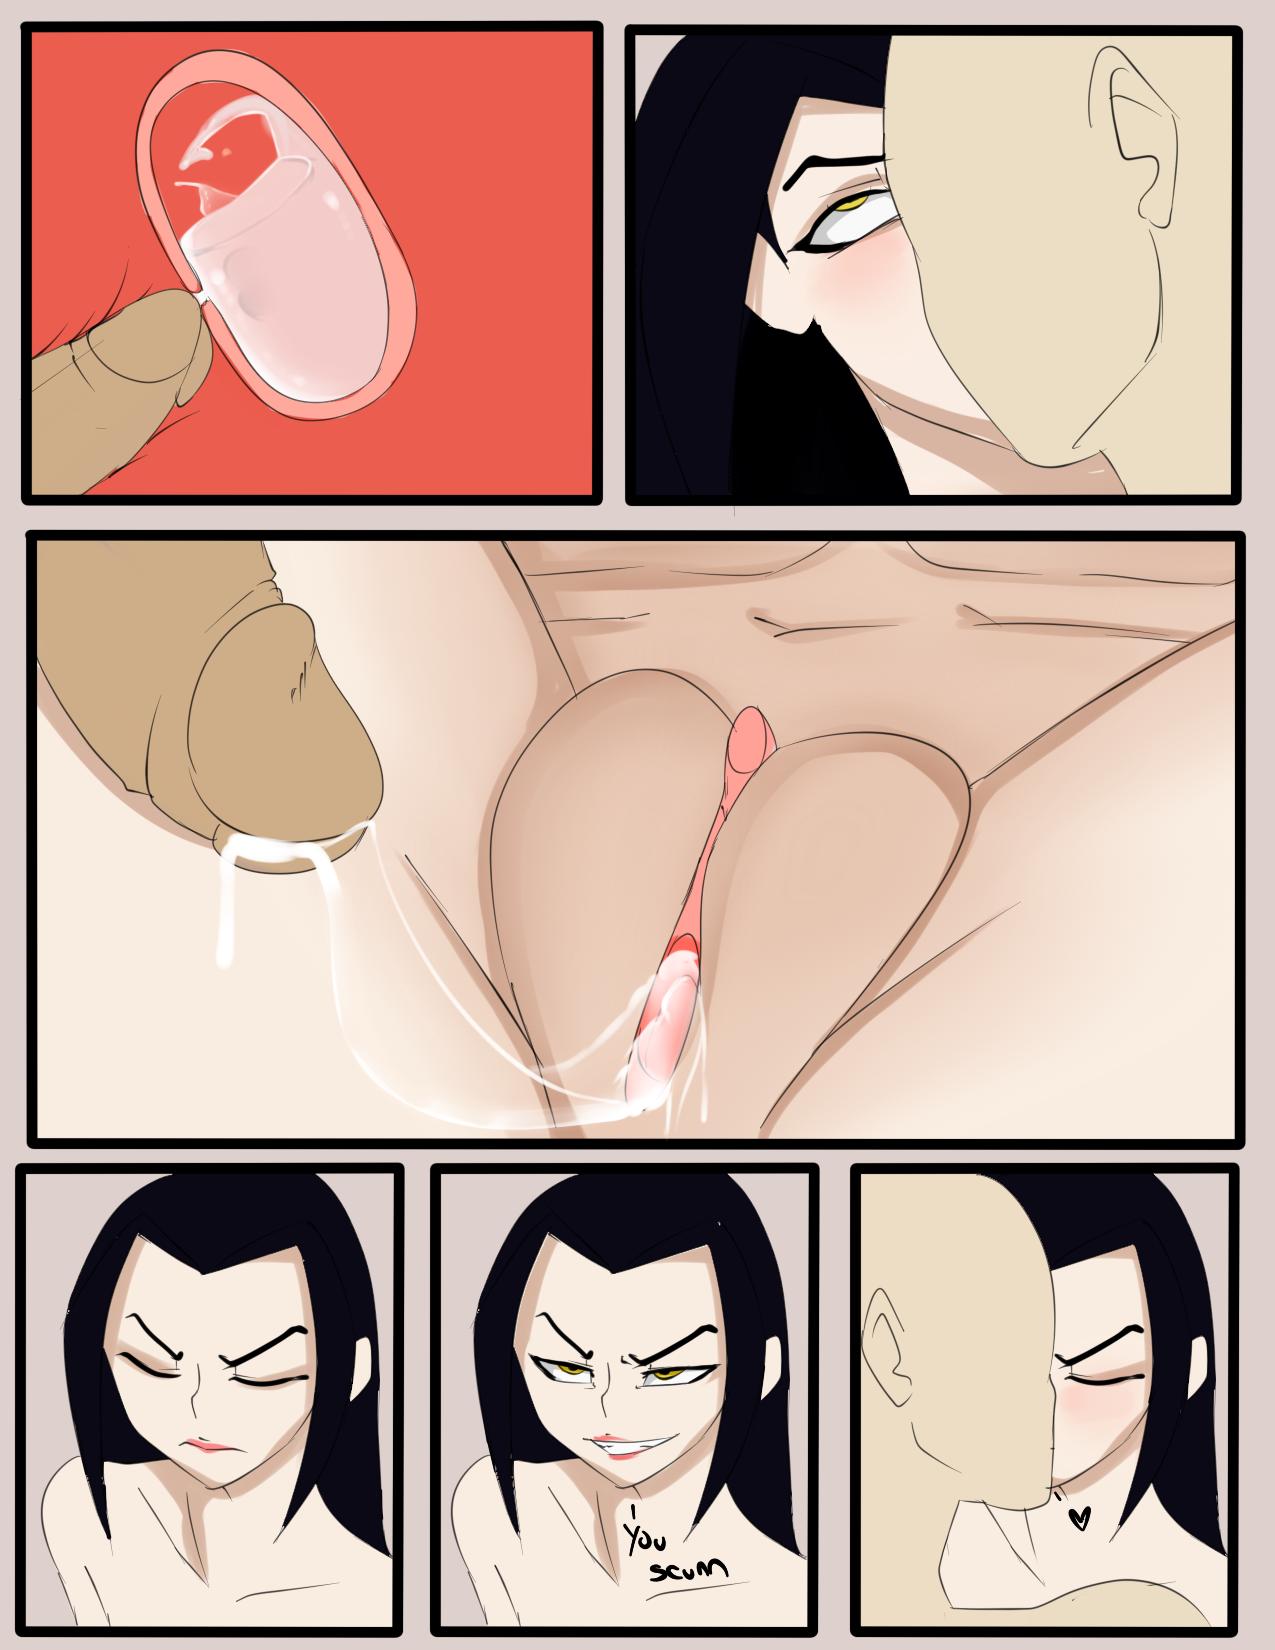 Submissive Azula porn comics Oral sex, Blowjob, Creampie, Deformed, Domination, Fantasy, Rape, Straight, Submission, X-Ray